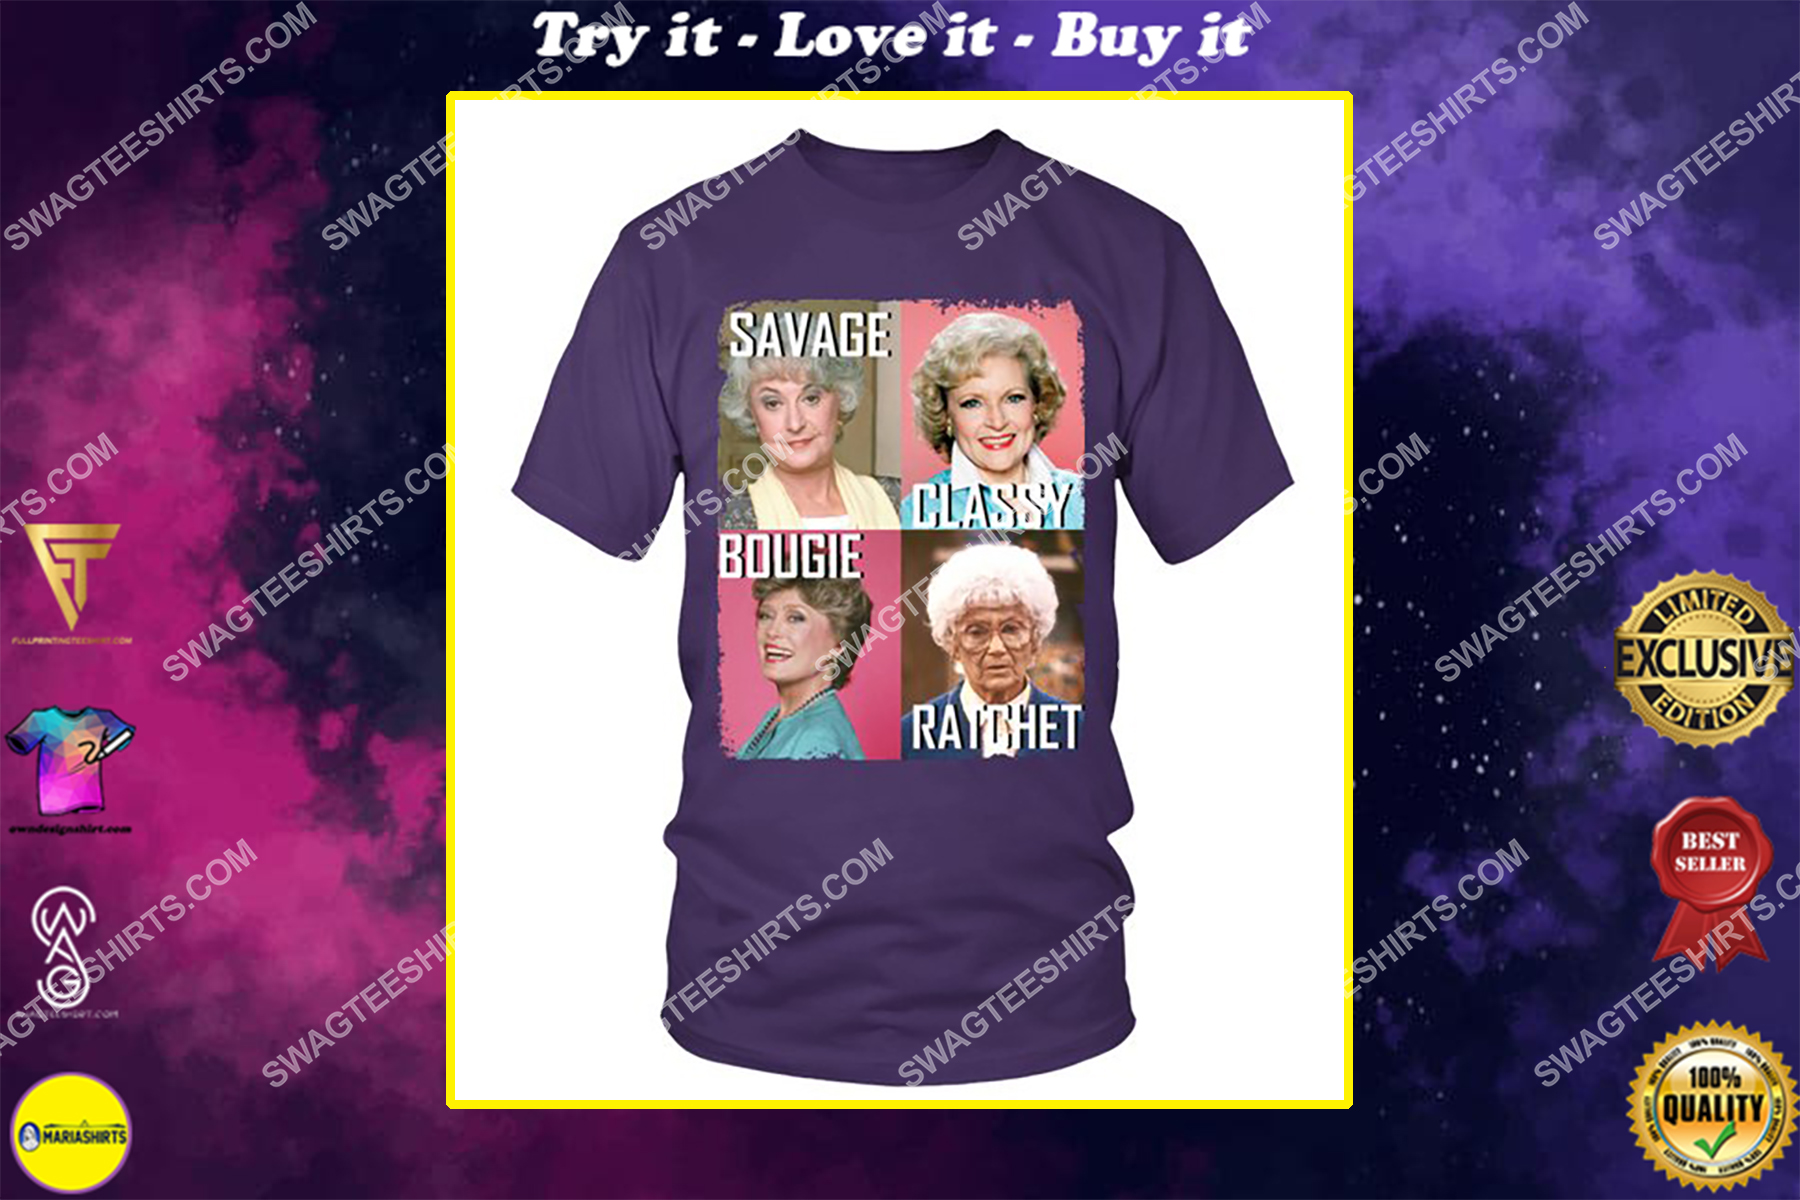 savage classy bougie ratchet the golden girls movie shirt